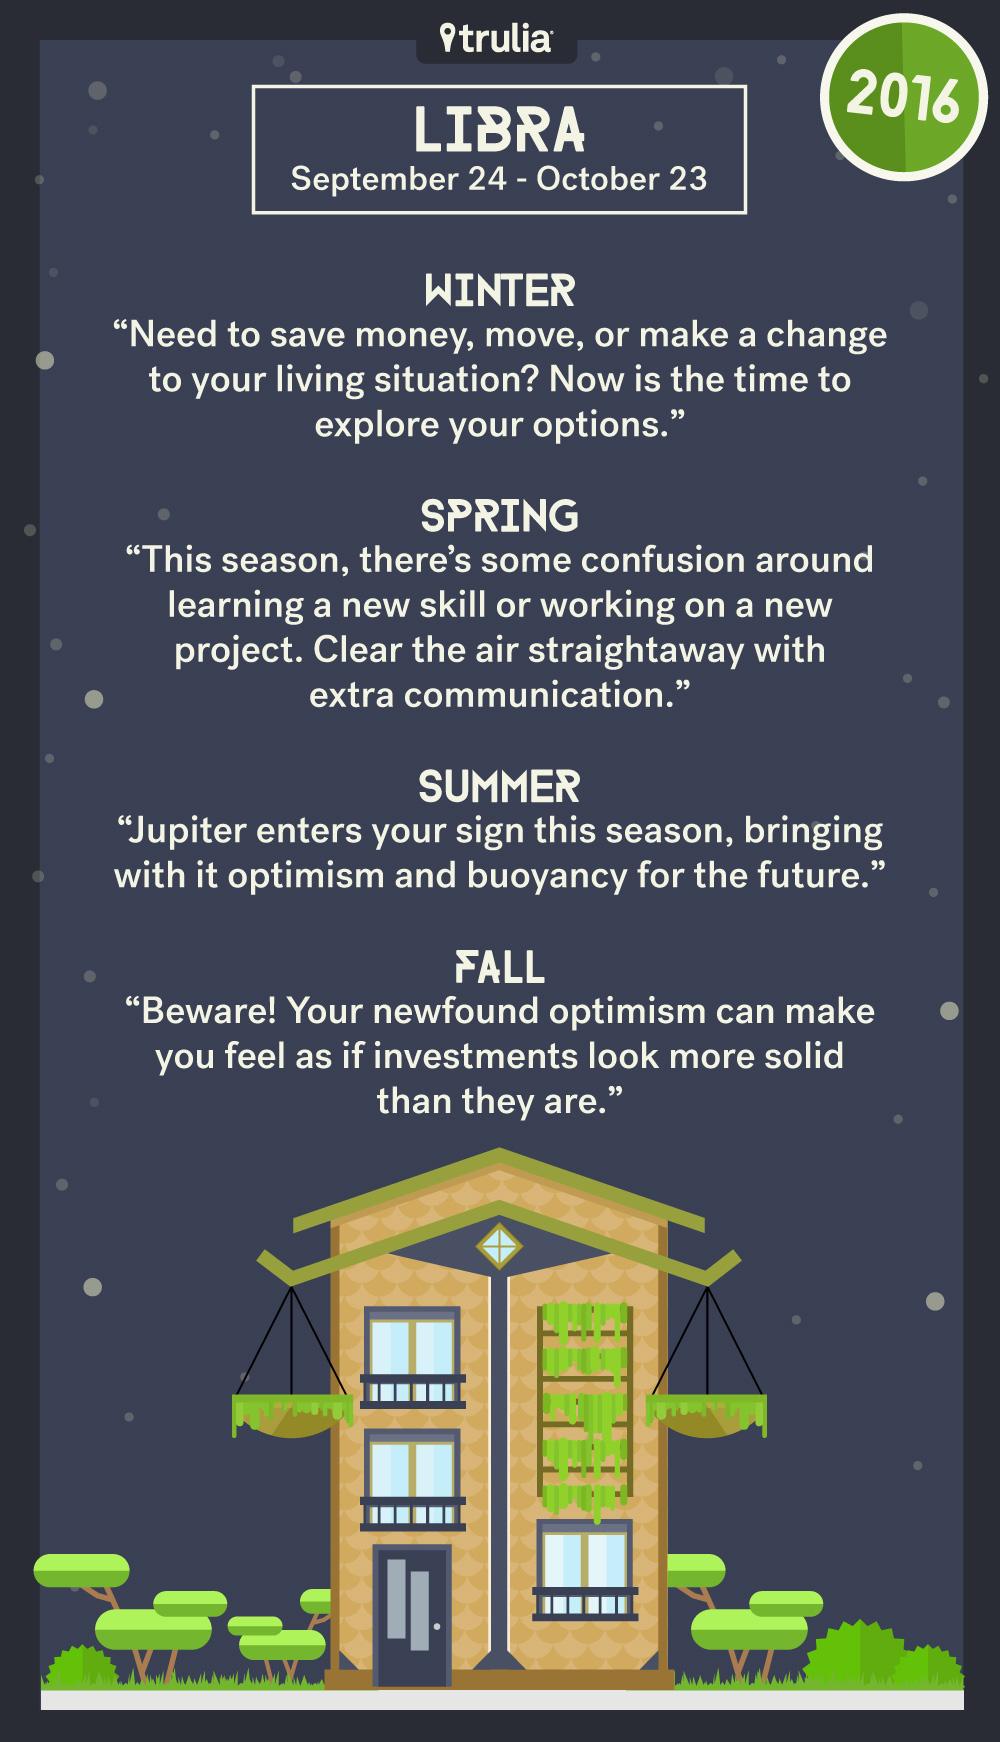 libra horoscope about money